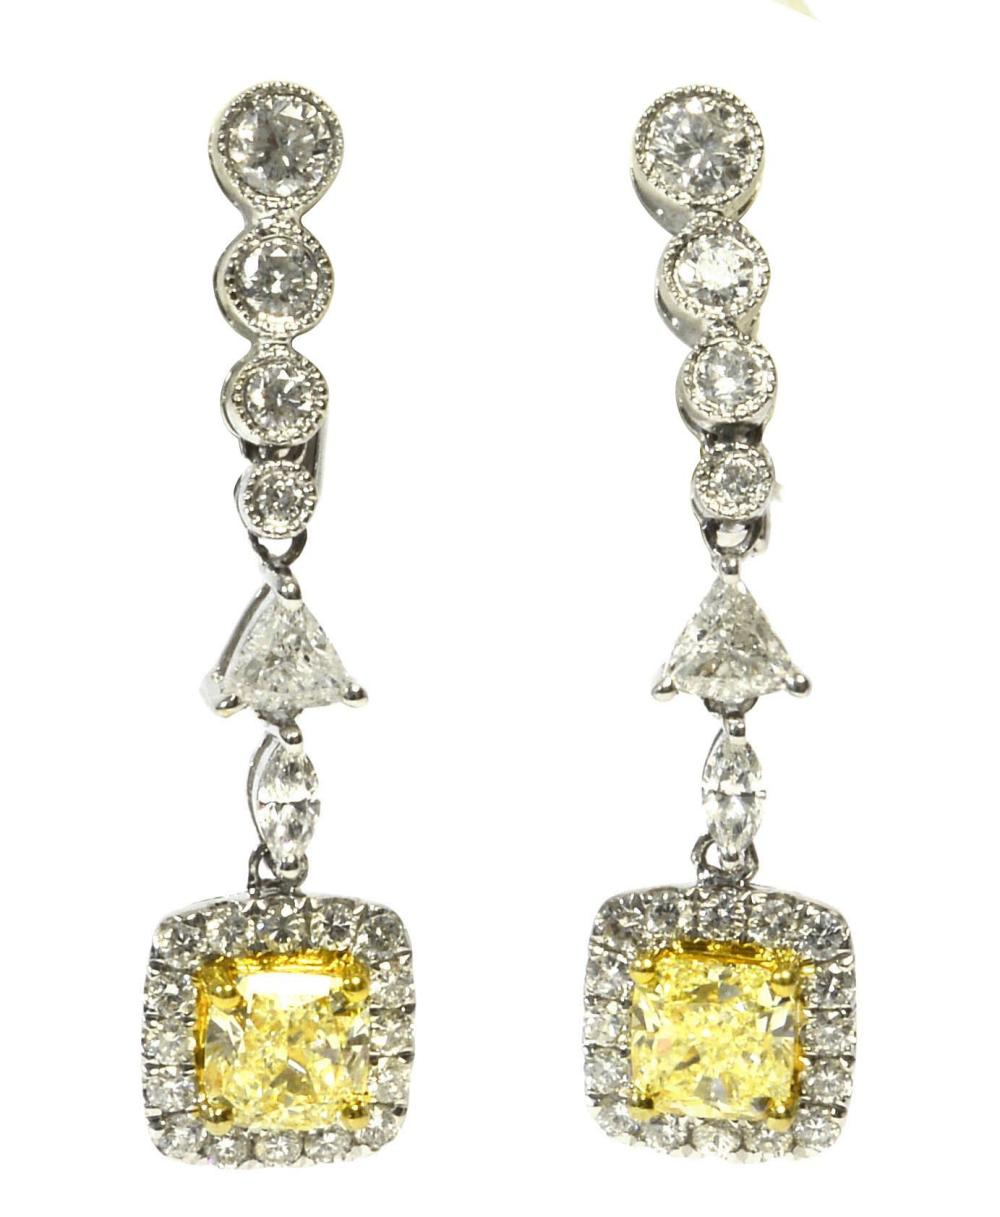 Fancy yellow diamonds 1.33 carats